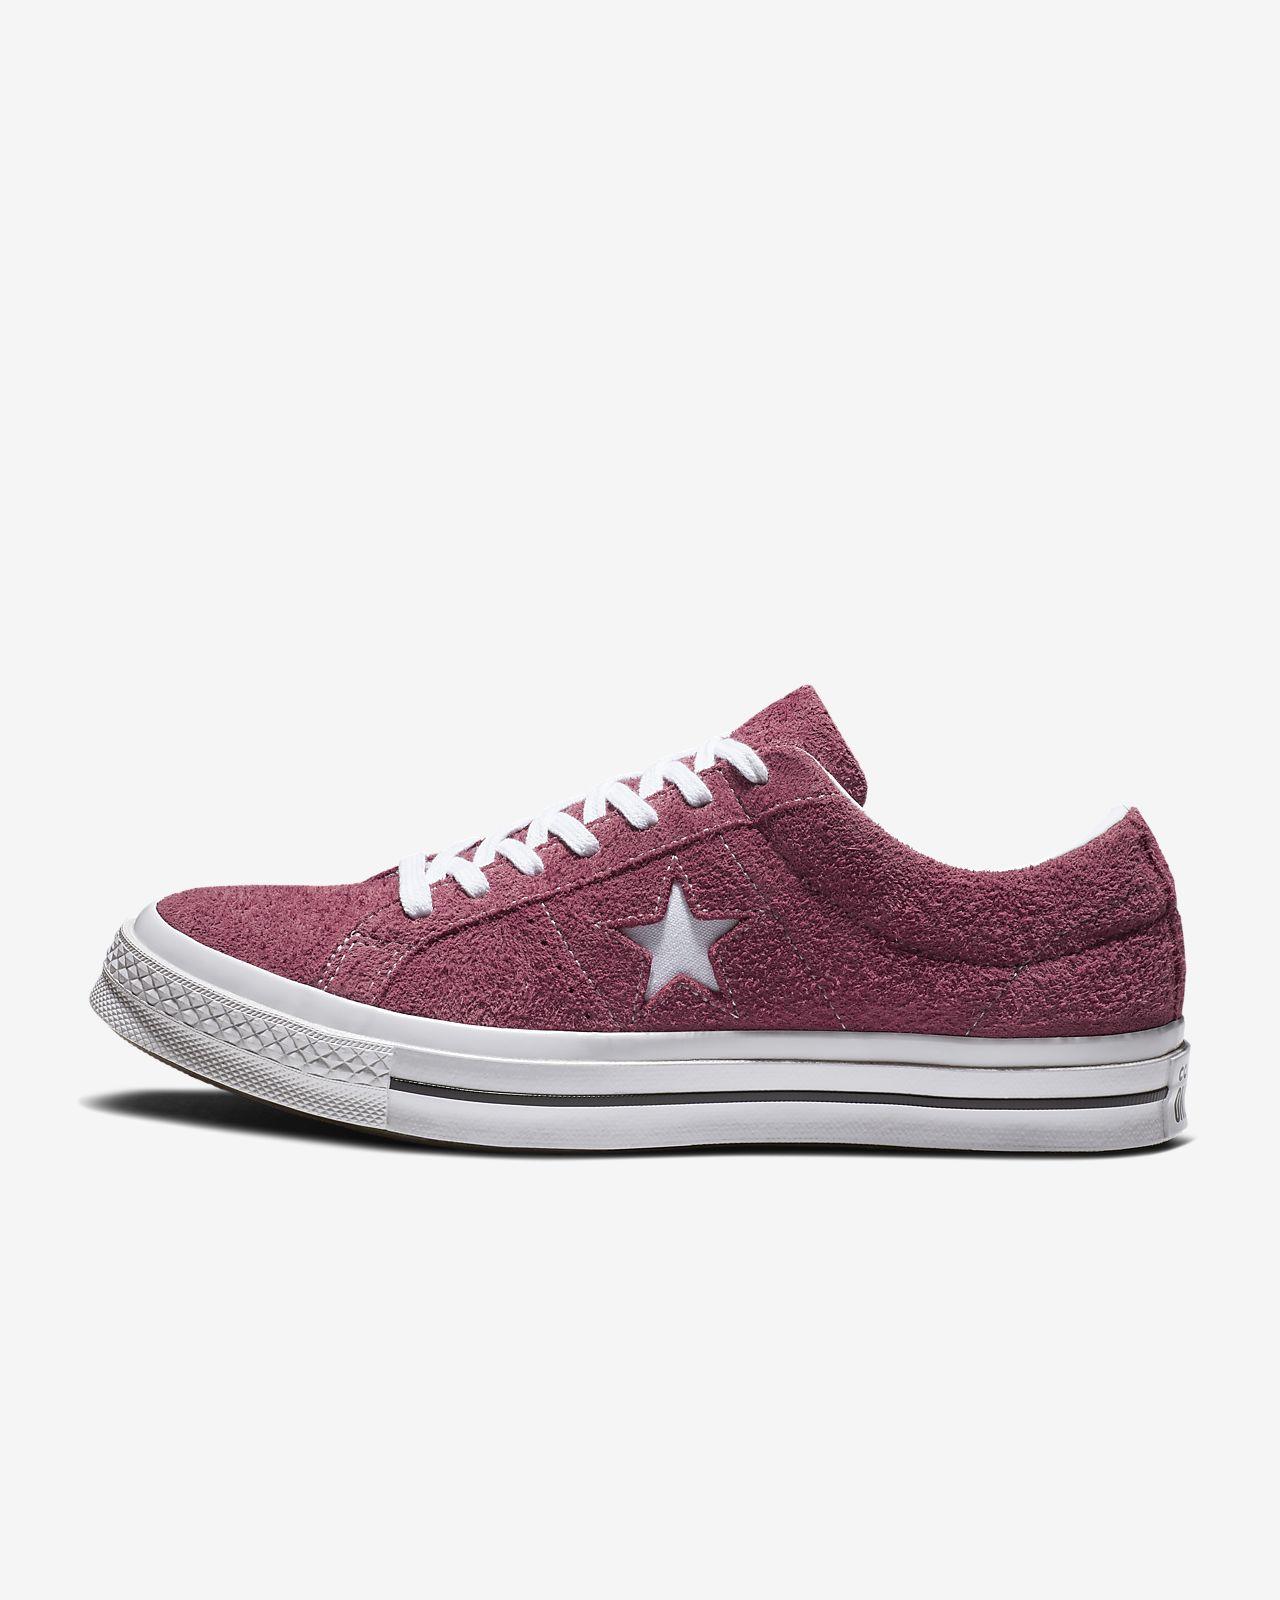 Converse One Star Premium Suede Low Top Men's Shoe